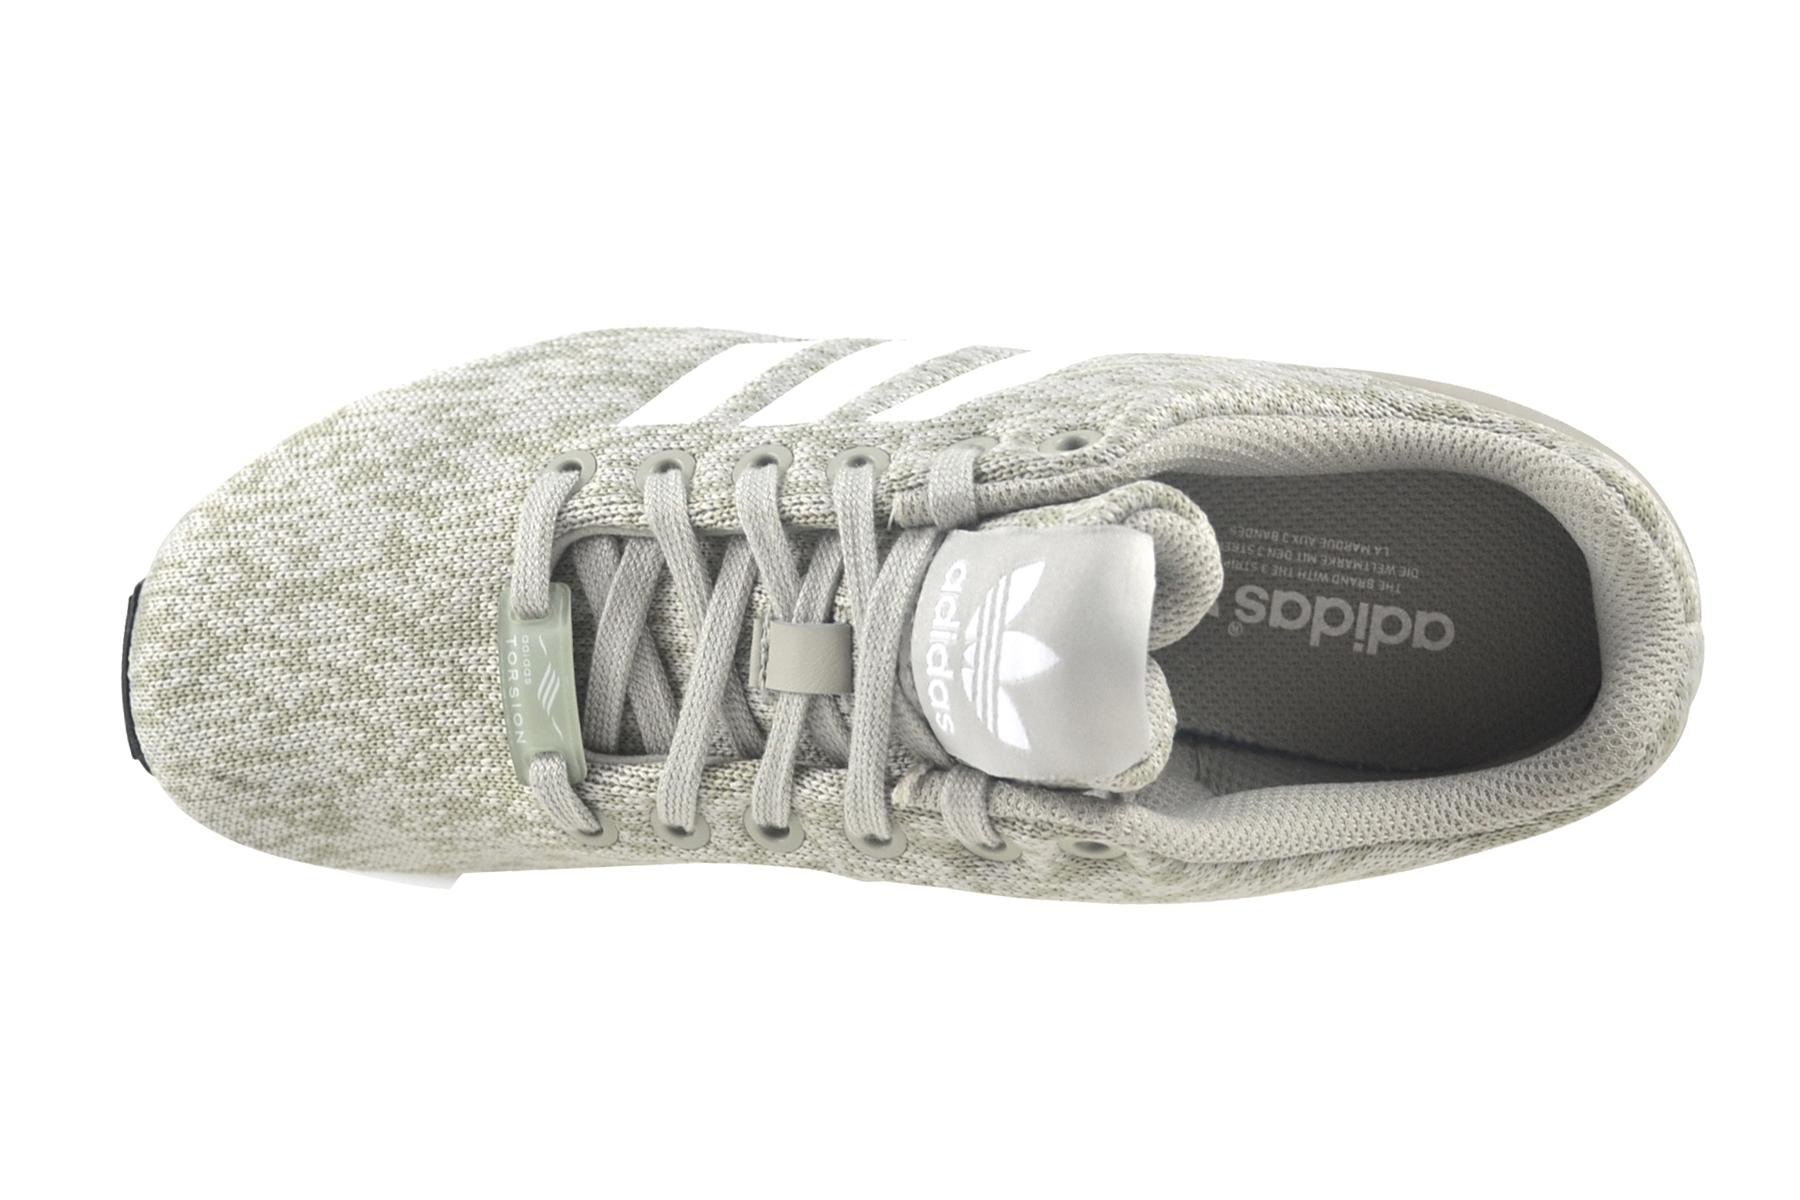 Details zu Adidas ZX Flux sesame white black Torsion Schuhe Sneaker grau BY9424